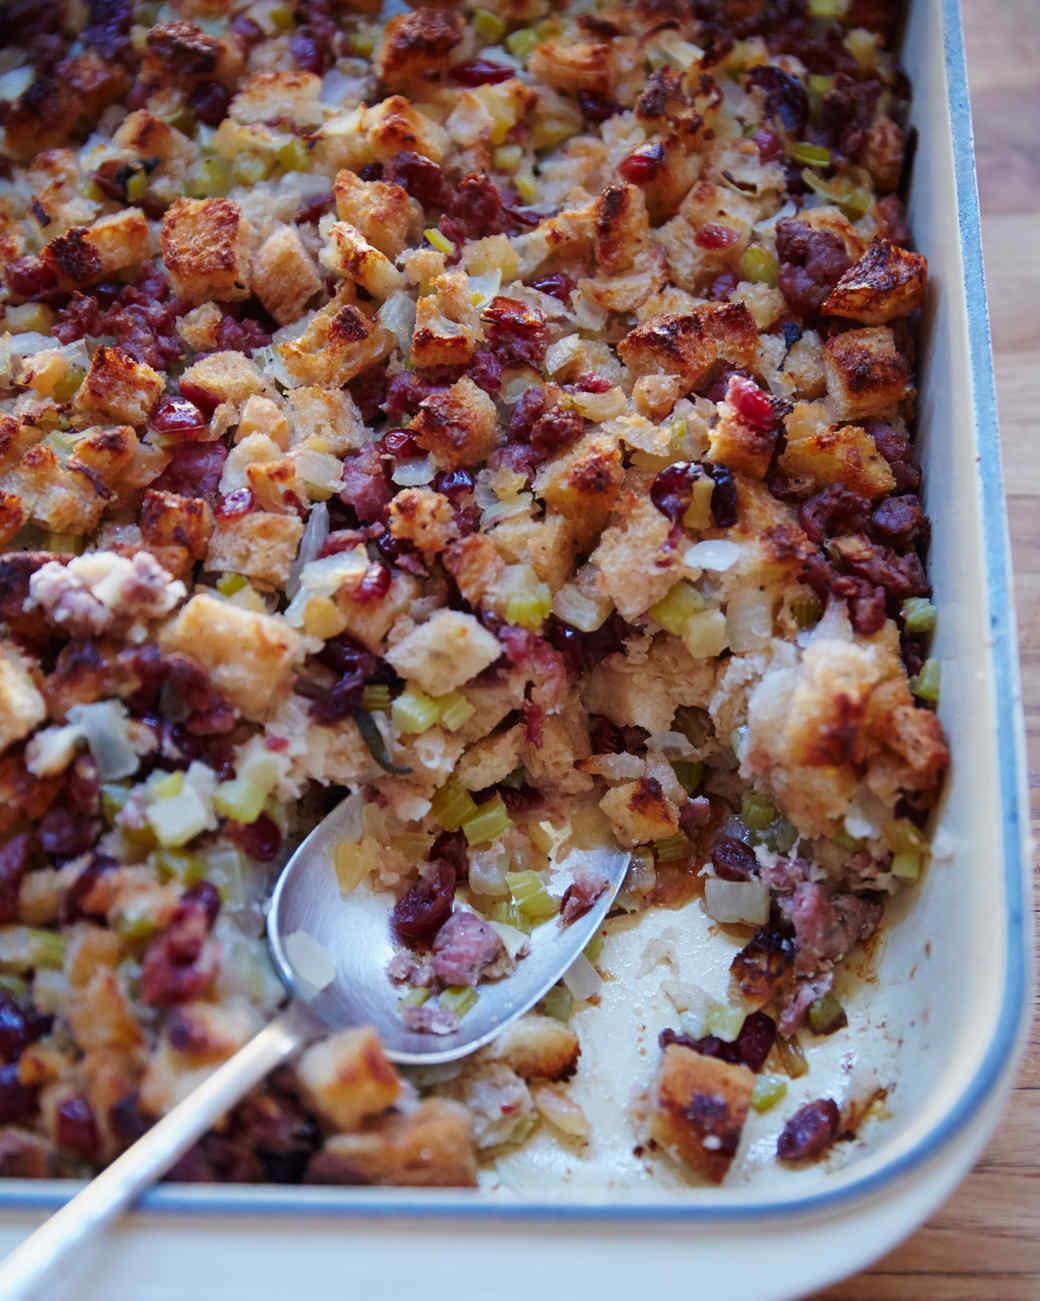 Thanksgiving Desserts Martha Stewart  Anne Quatrano s Thanksgiving Recipes